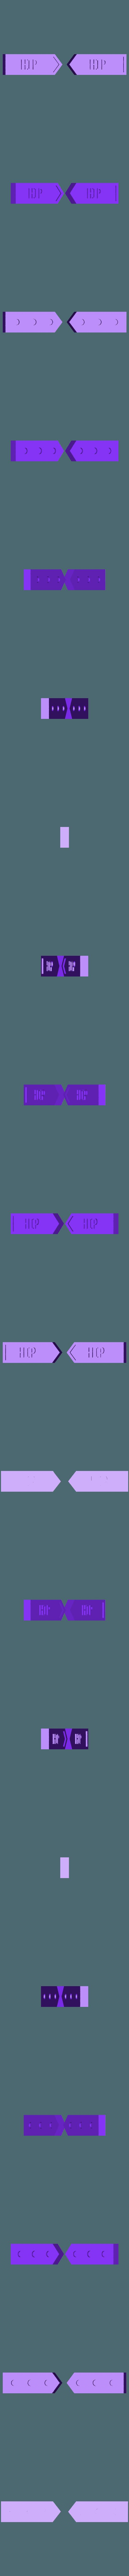 HIp.stl Download free STL file Body Part Arrow Magnets • 3D printable model, EmbossIndustries